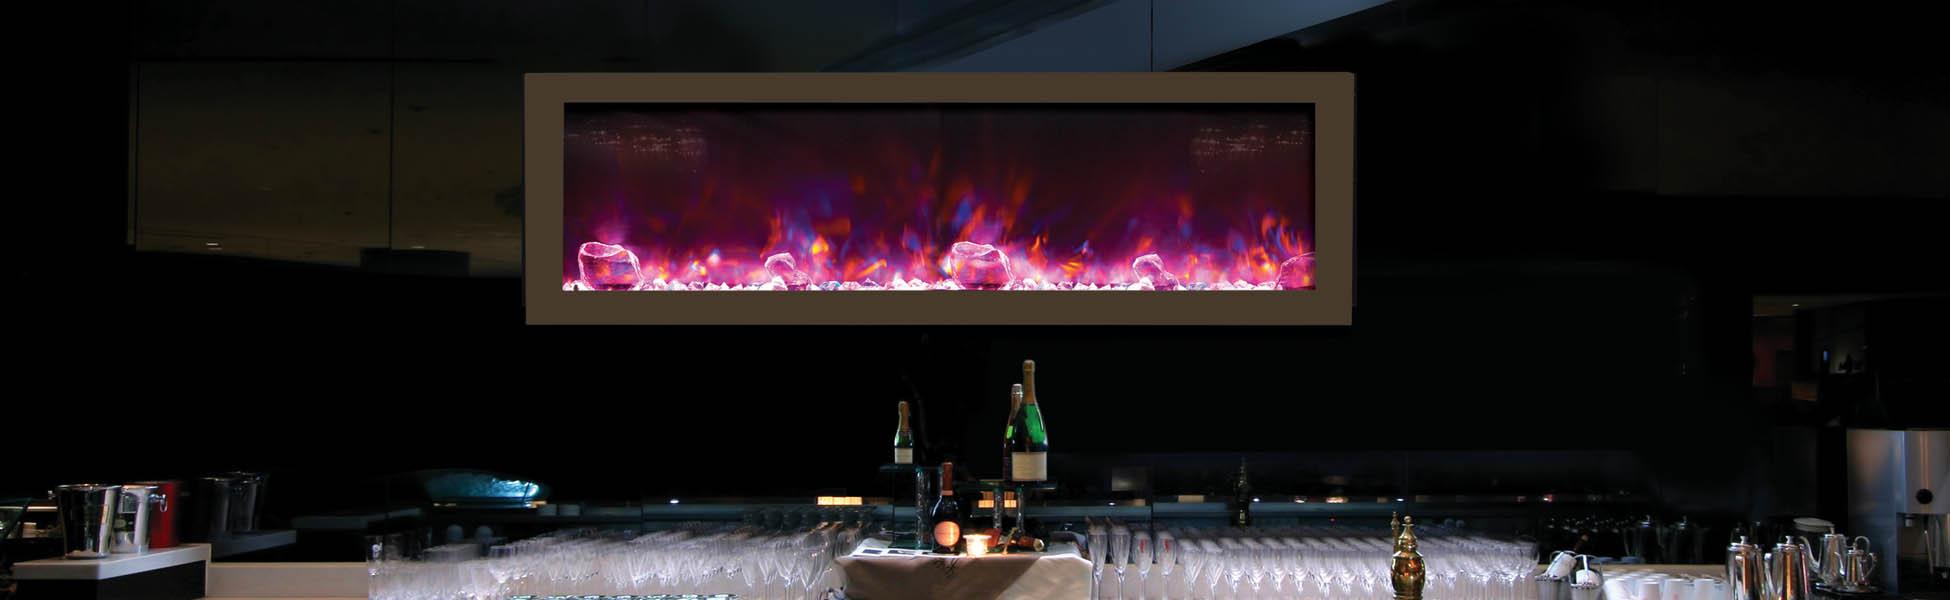 Amantii electric fireplacews